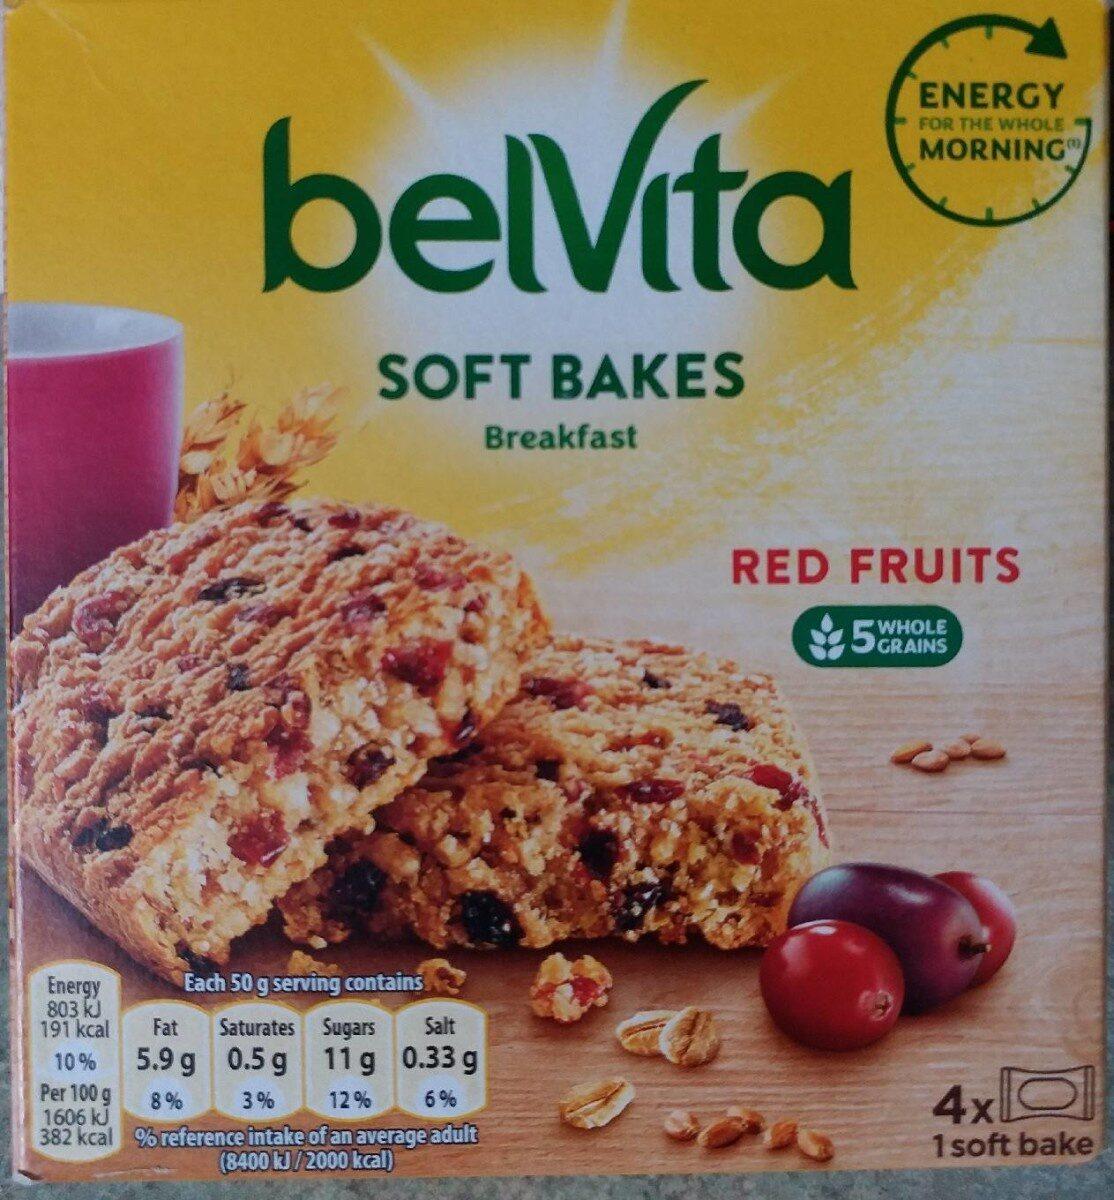 Belvita soft bakes - Product - en